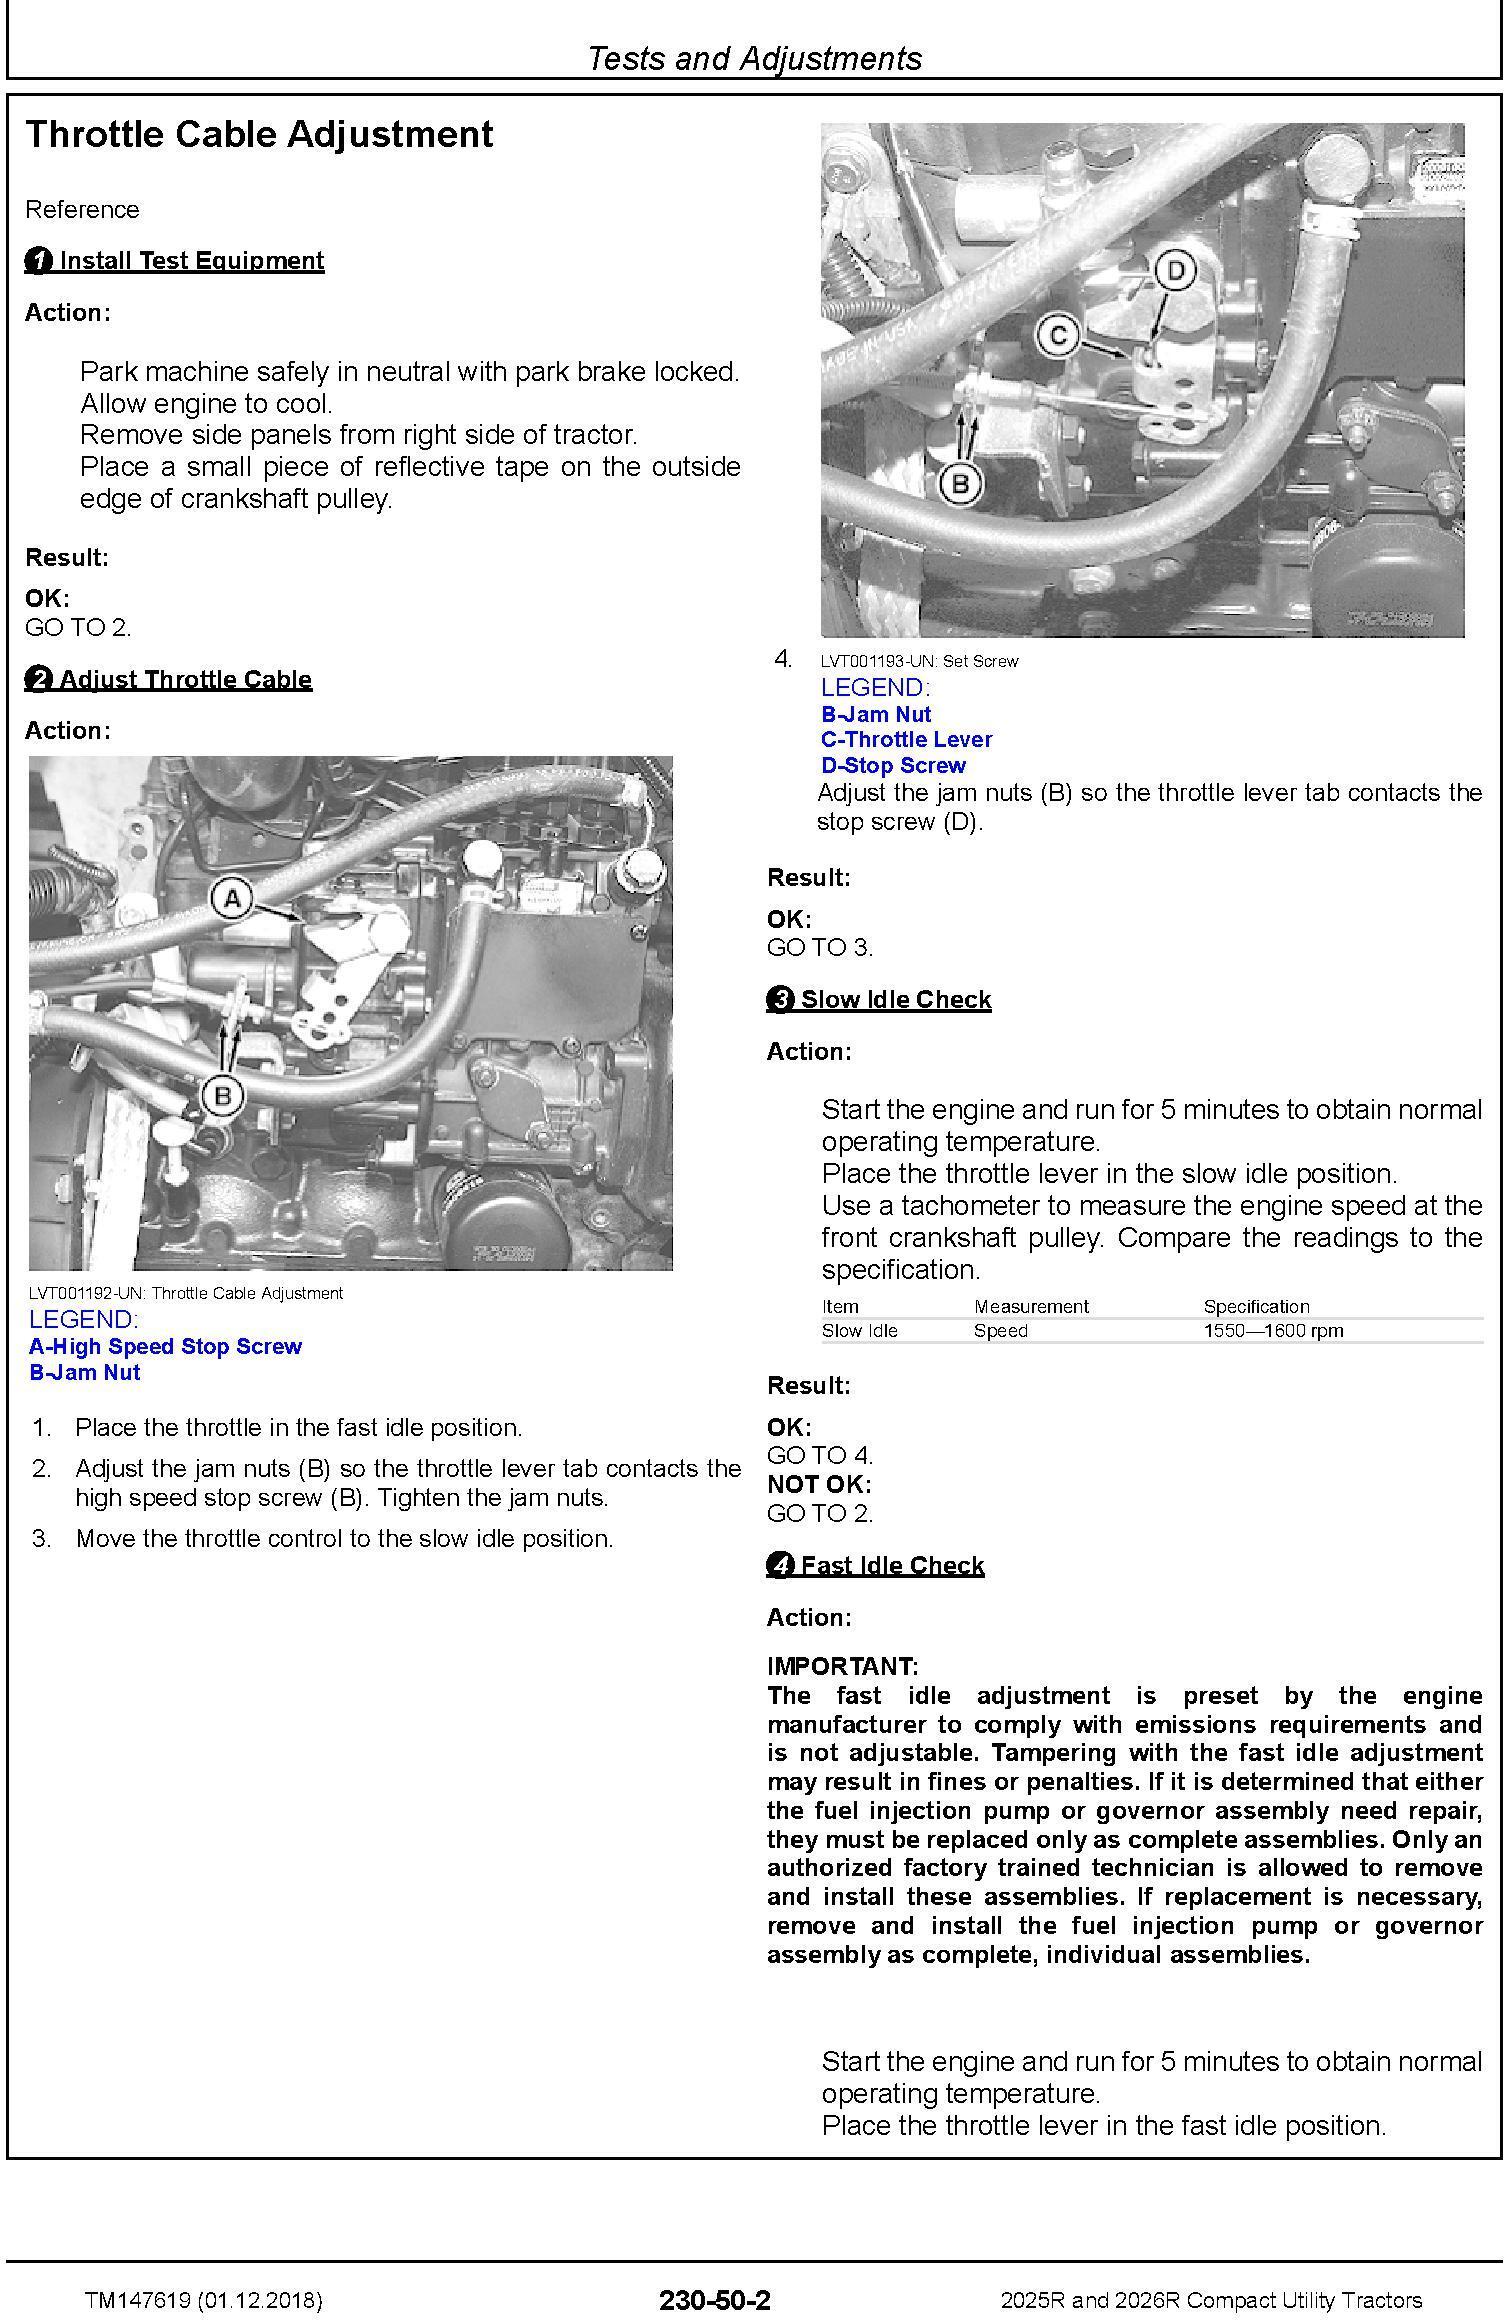 John Deere 2025R, 2026R Compact Utility Tractors (SN.HH100001-) Technical Service Manual (TM147619) - 1